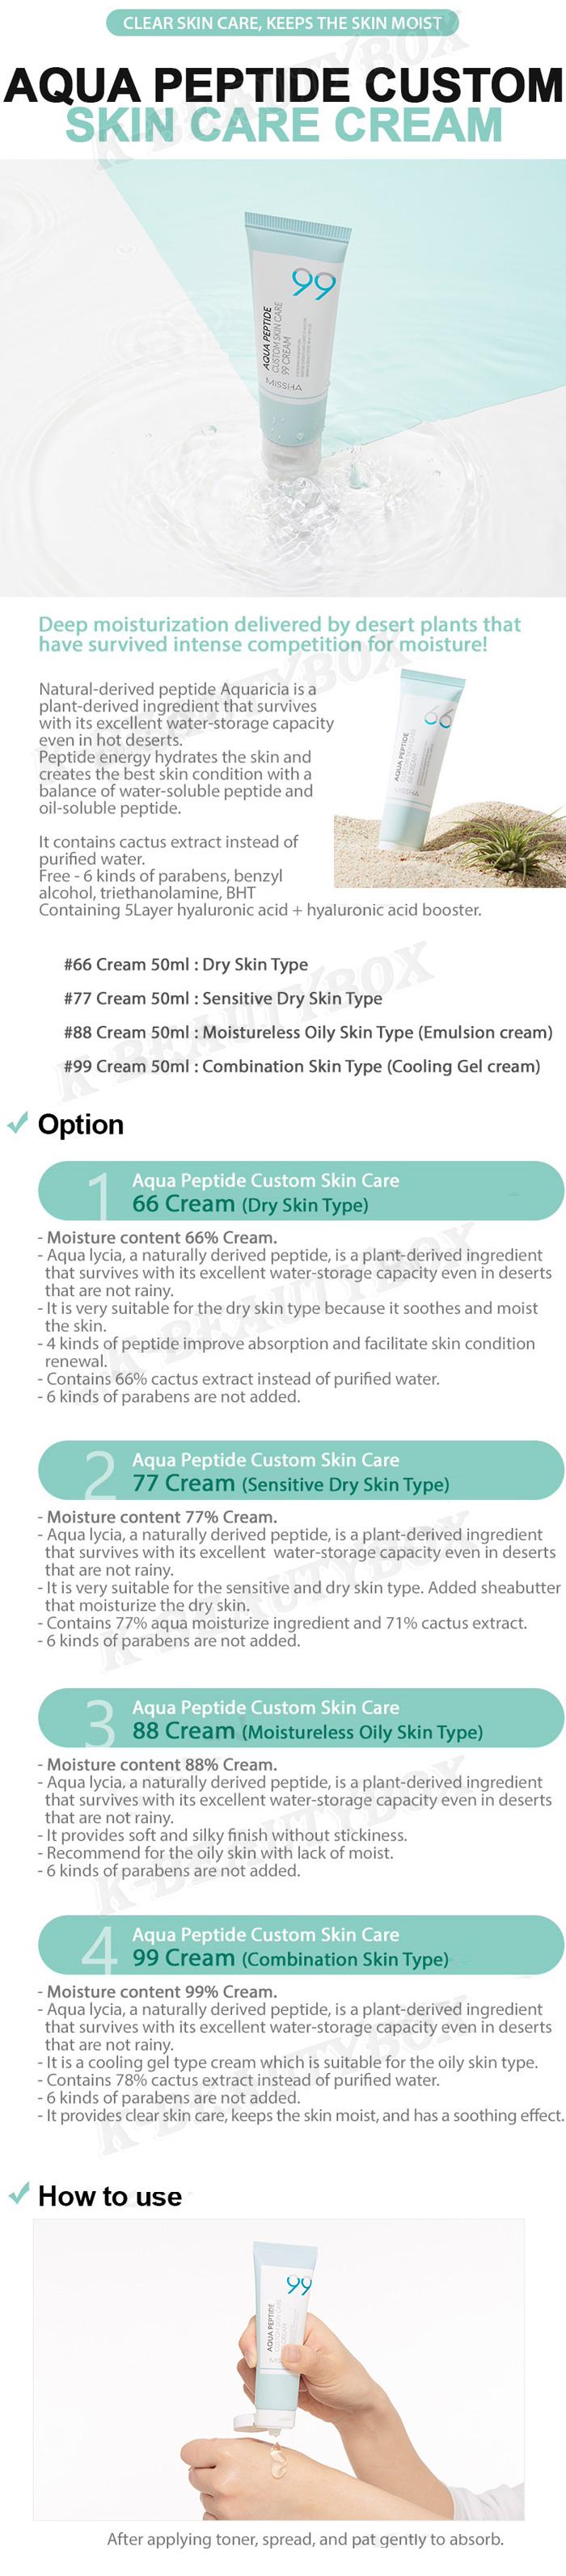 Missha Aqua Peptide Custom Skin Care 99 Cream 50ml 99 Moisture Full Cream 8801427297149 Ebay